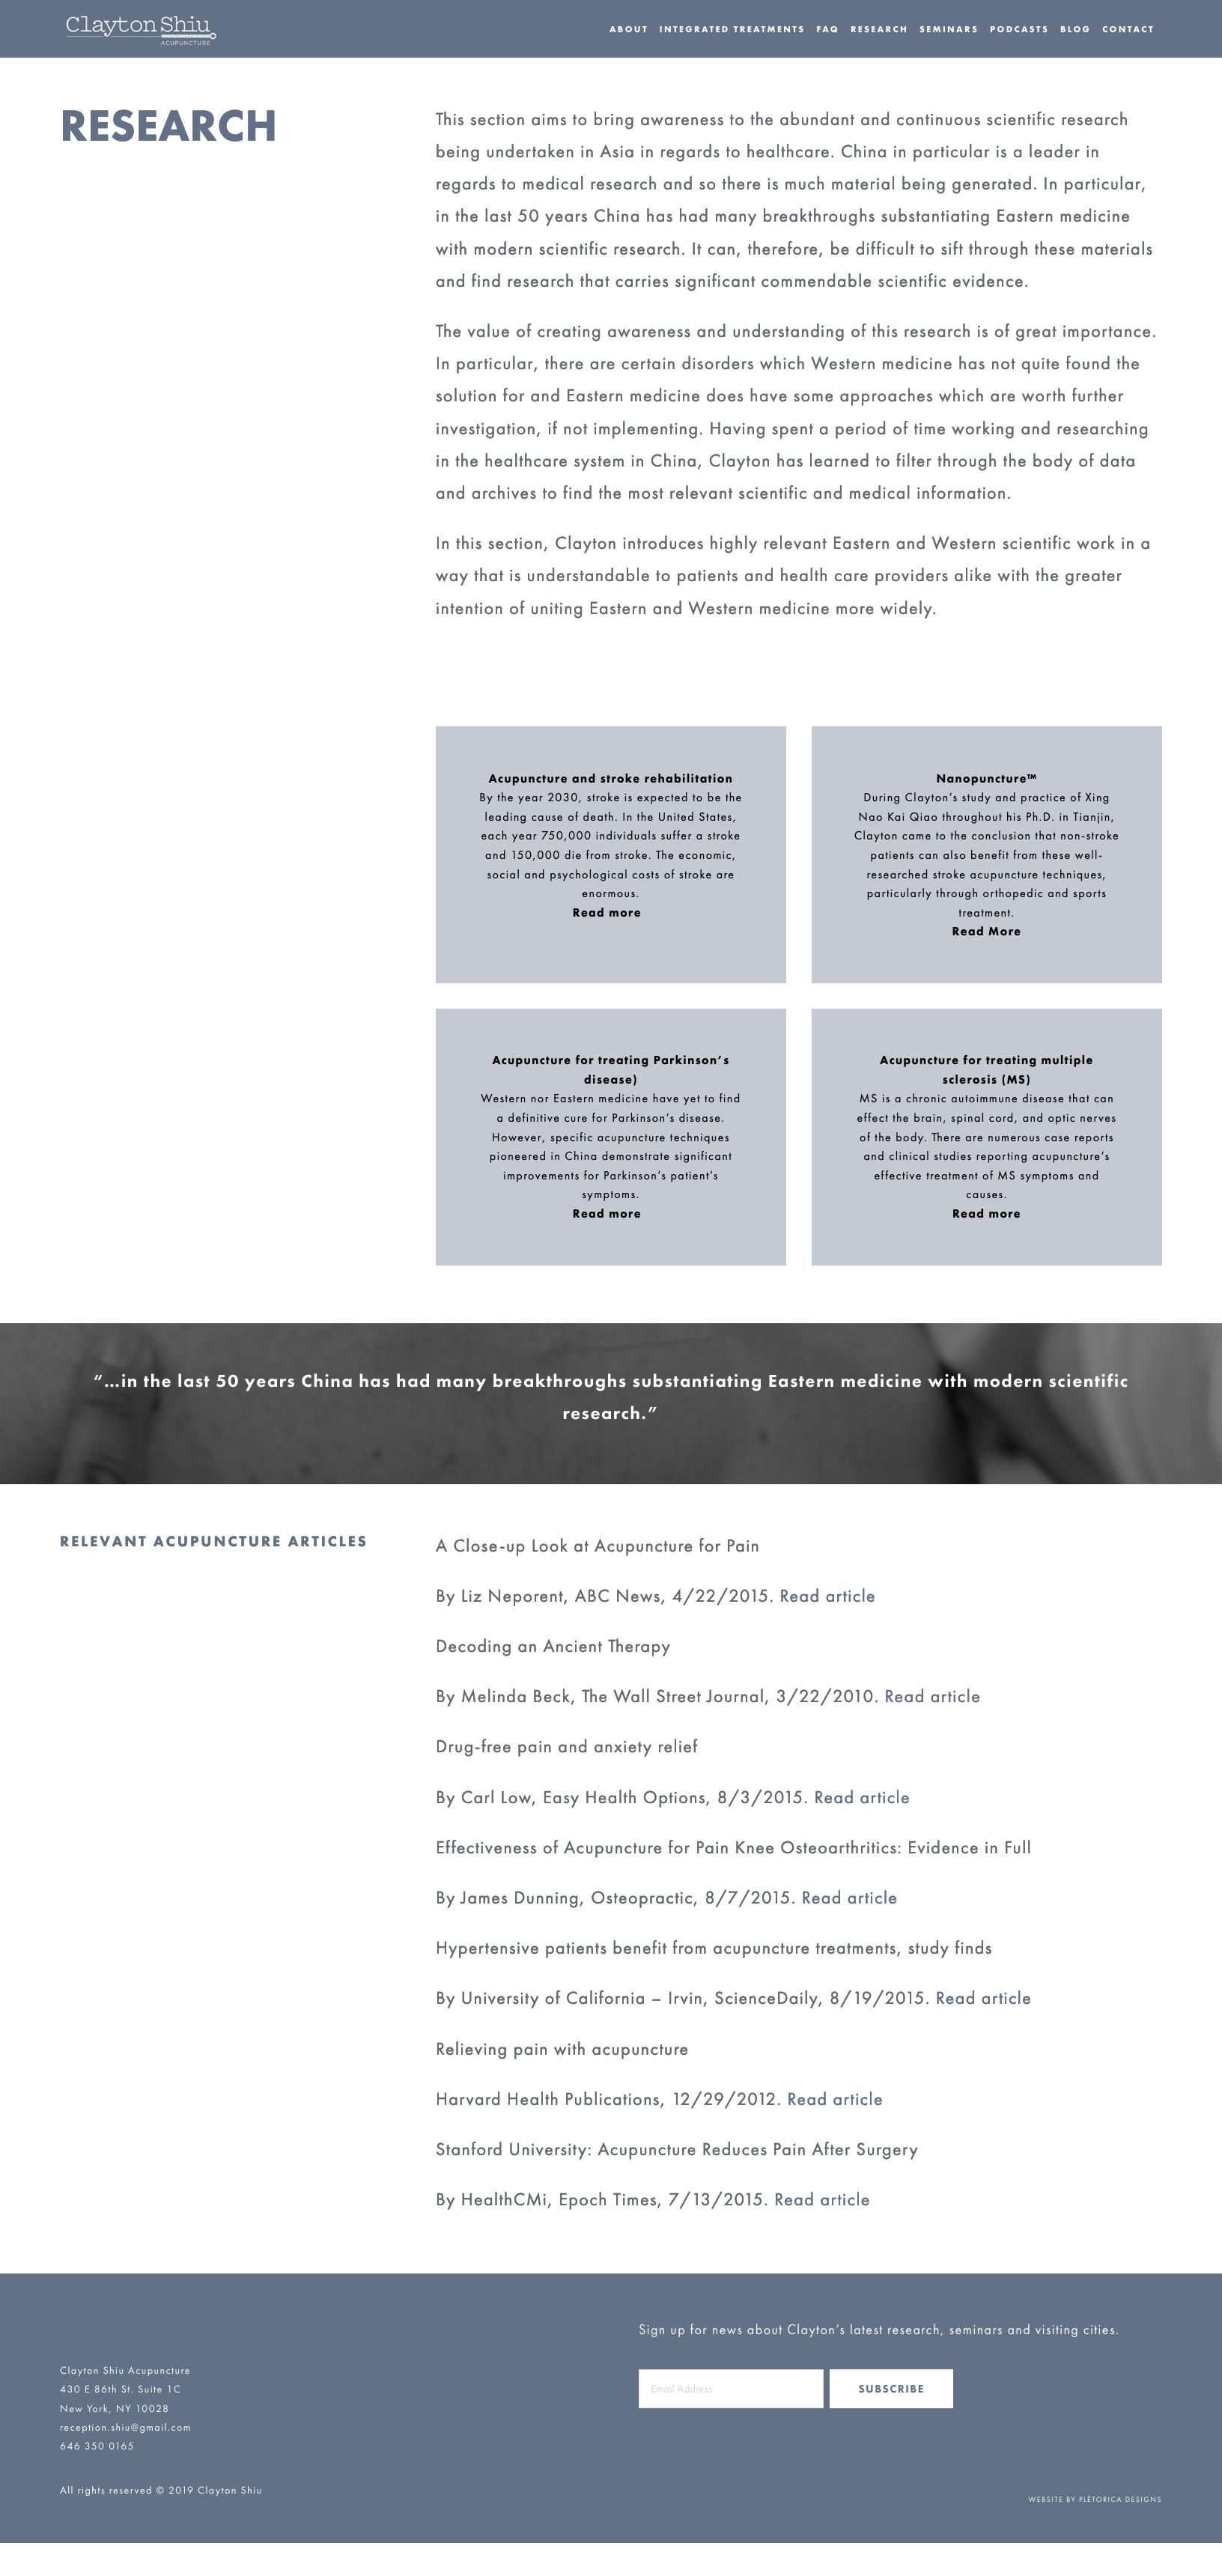 Screenshot_2019-03-17 RESEARCH — Clayton Shiu Acupuncture.png